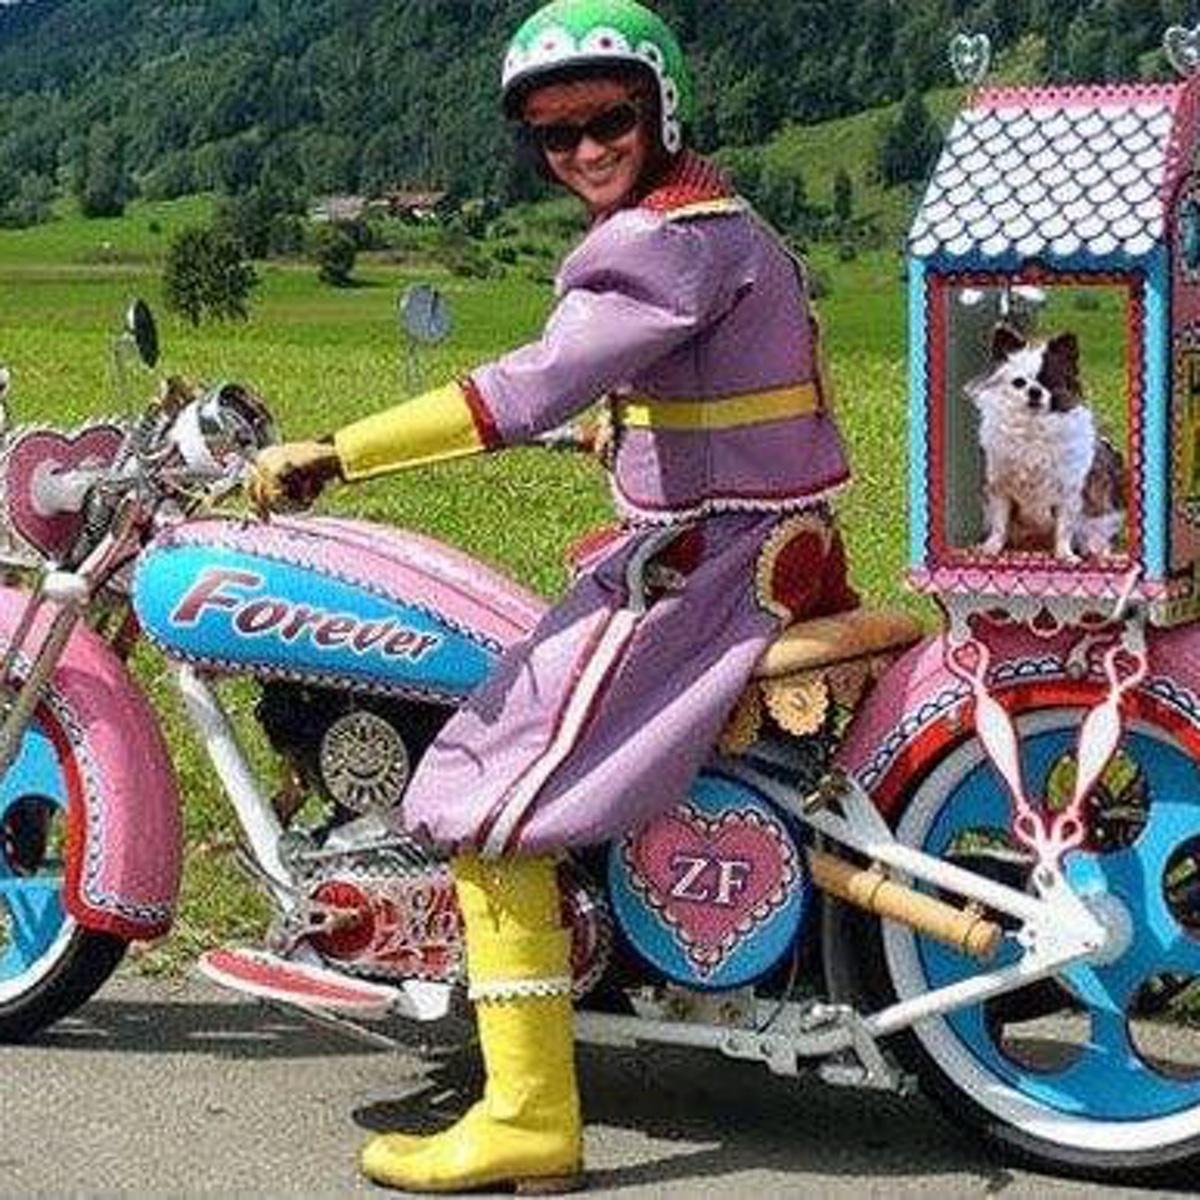 onmotorcycle